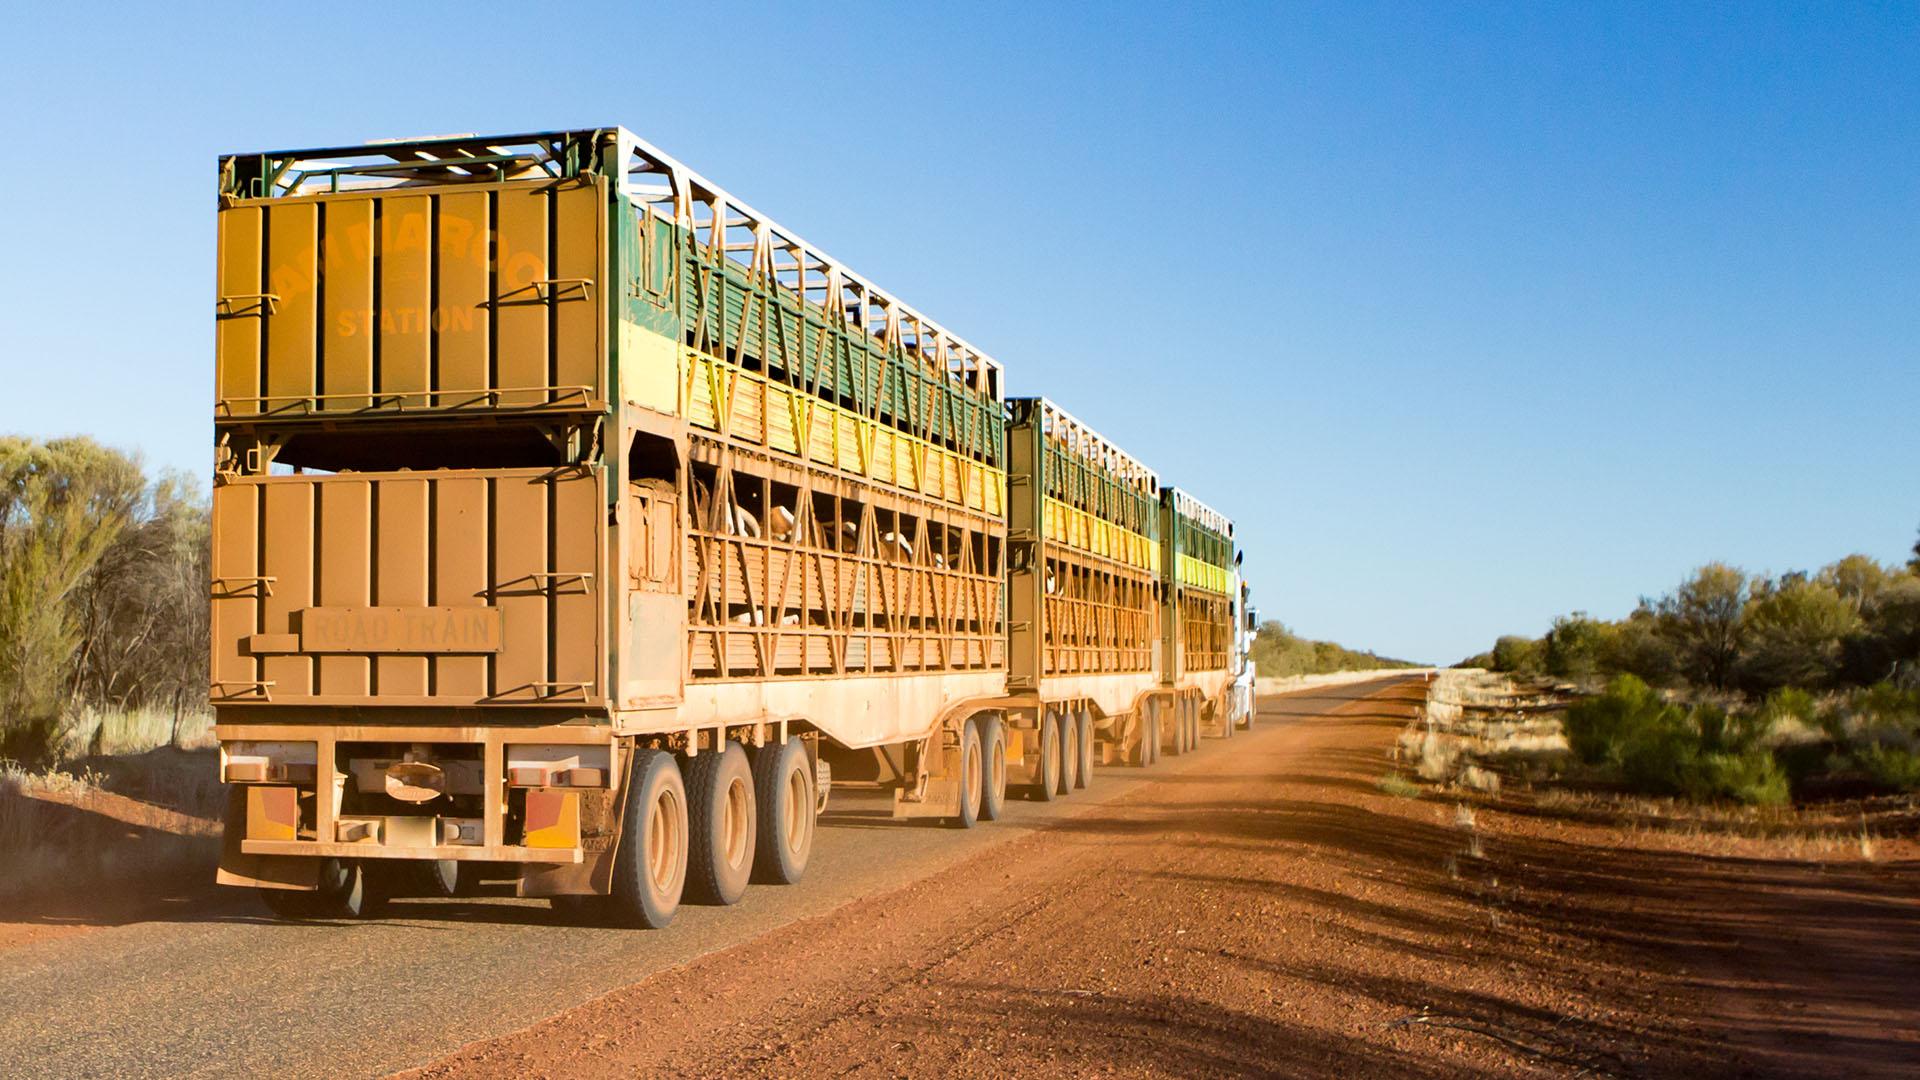 Gemtree, Australia - July 6 2015: An iconic 3 trailer Australian road train travels along the Plenty Hwy near Gemtree in Northern Territory, Australia